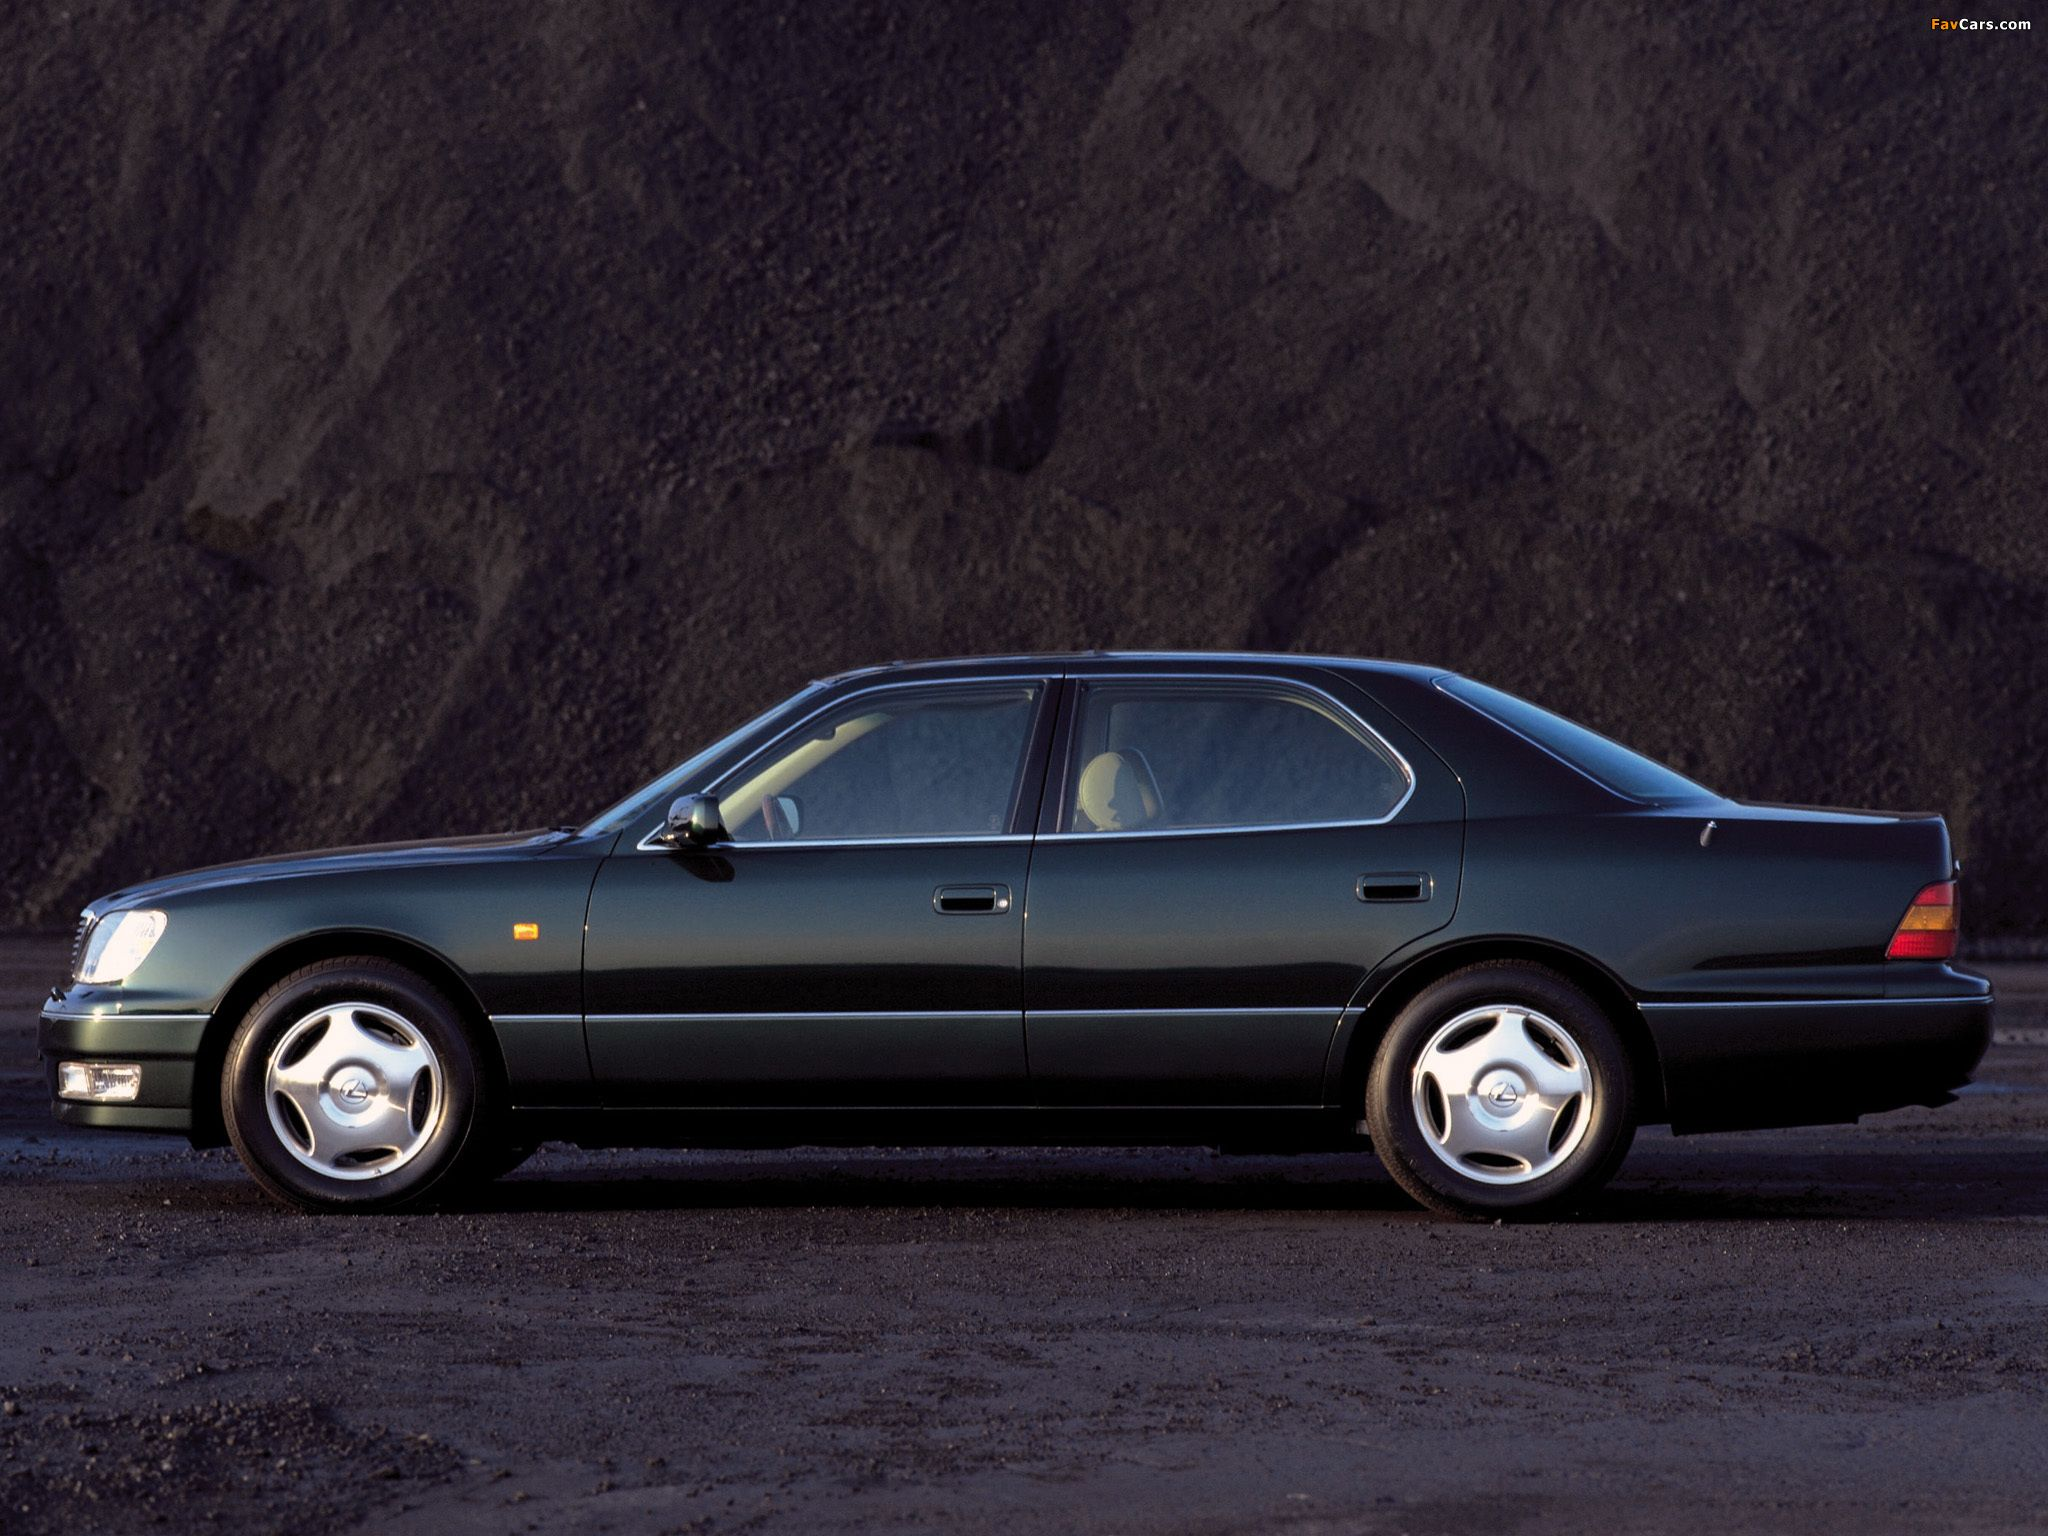 hight resolution of 1997 lexus ls400 lexus gs300 fuel economy japanese cars car photos model